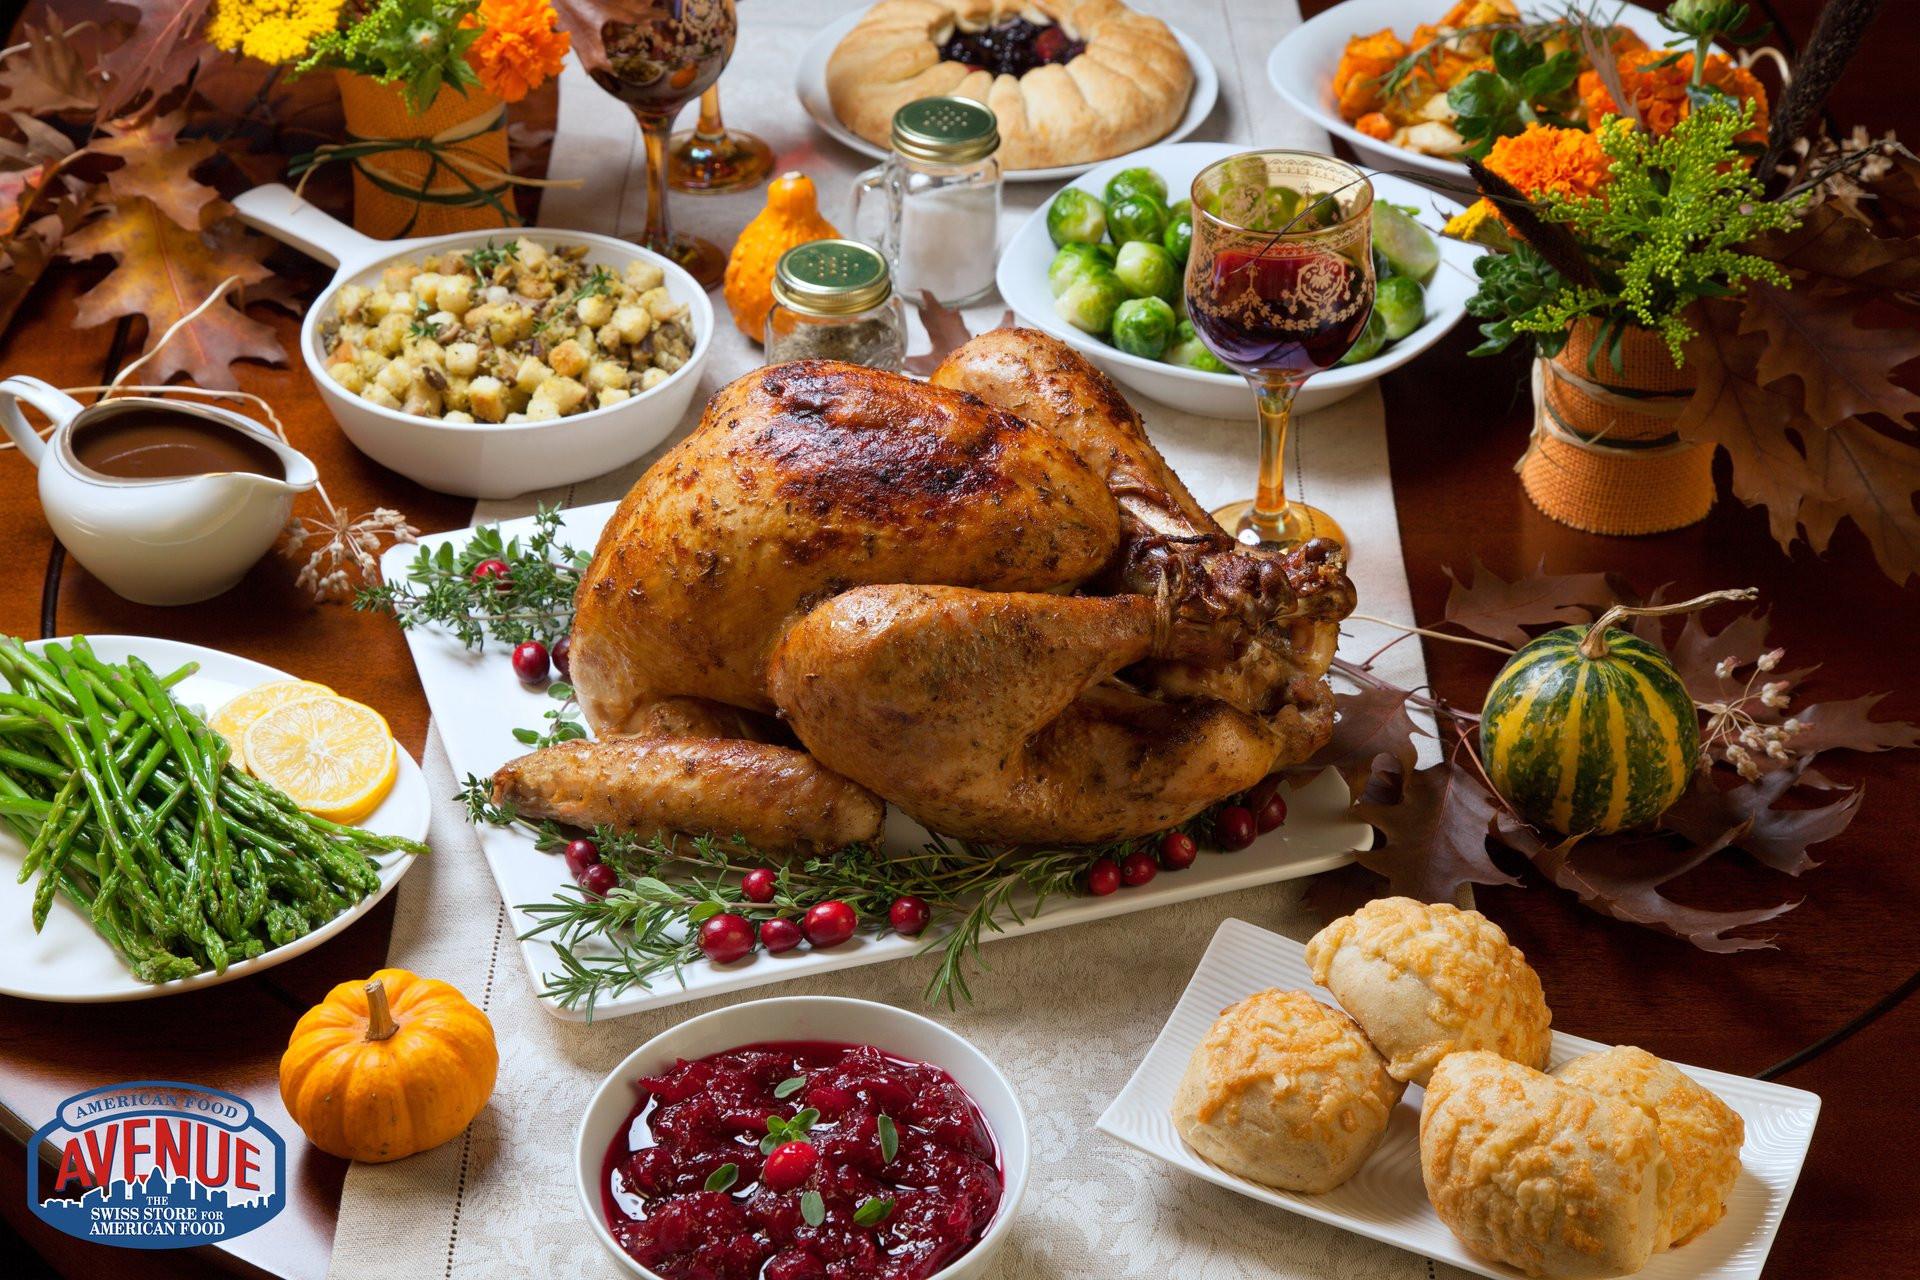 Wegmans Turkey Dinner Thanksgiving 2019  American Food Avenue The Swiss Store for American Food